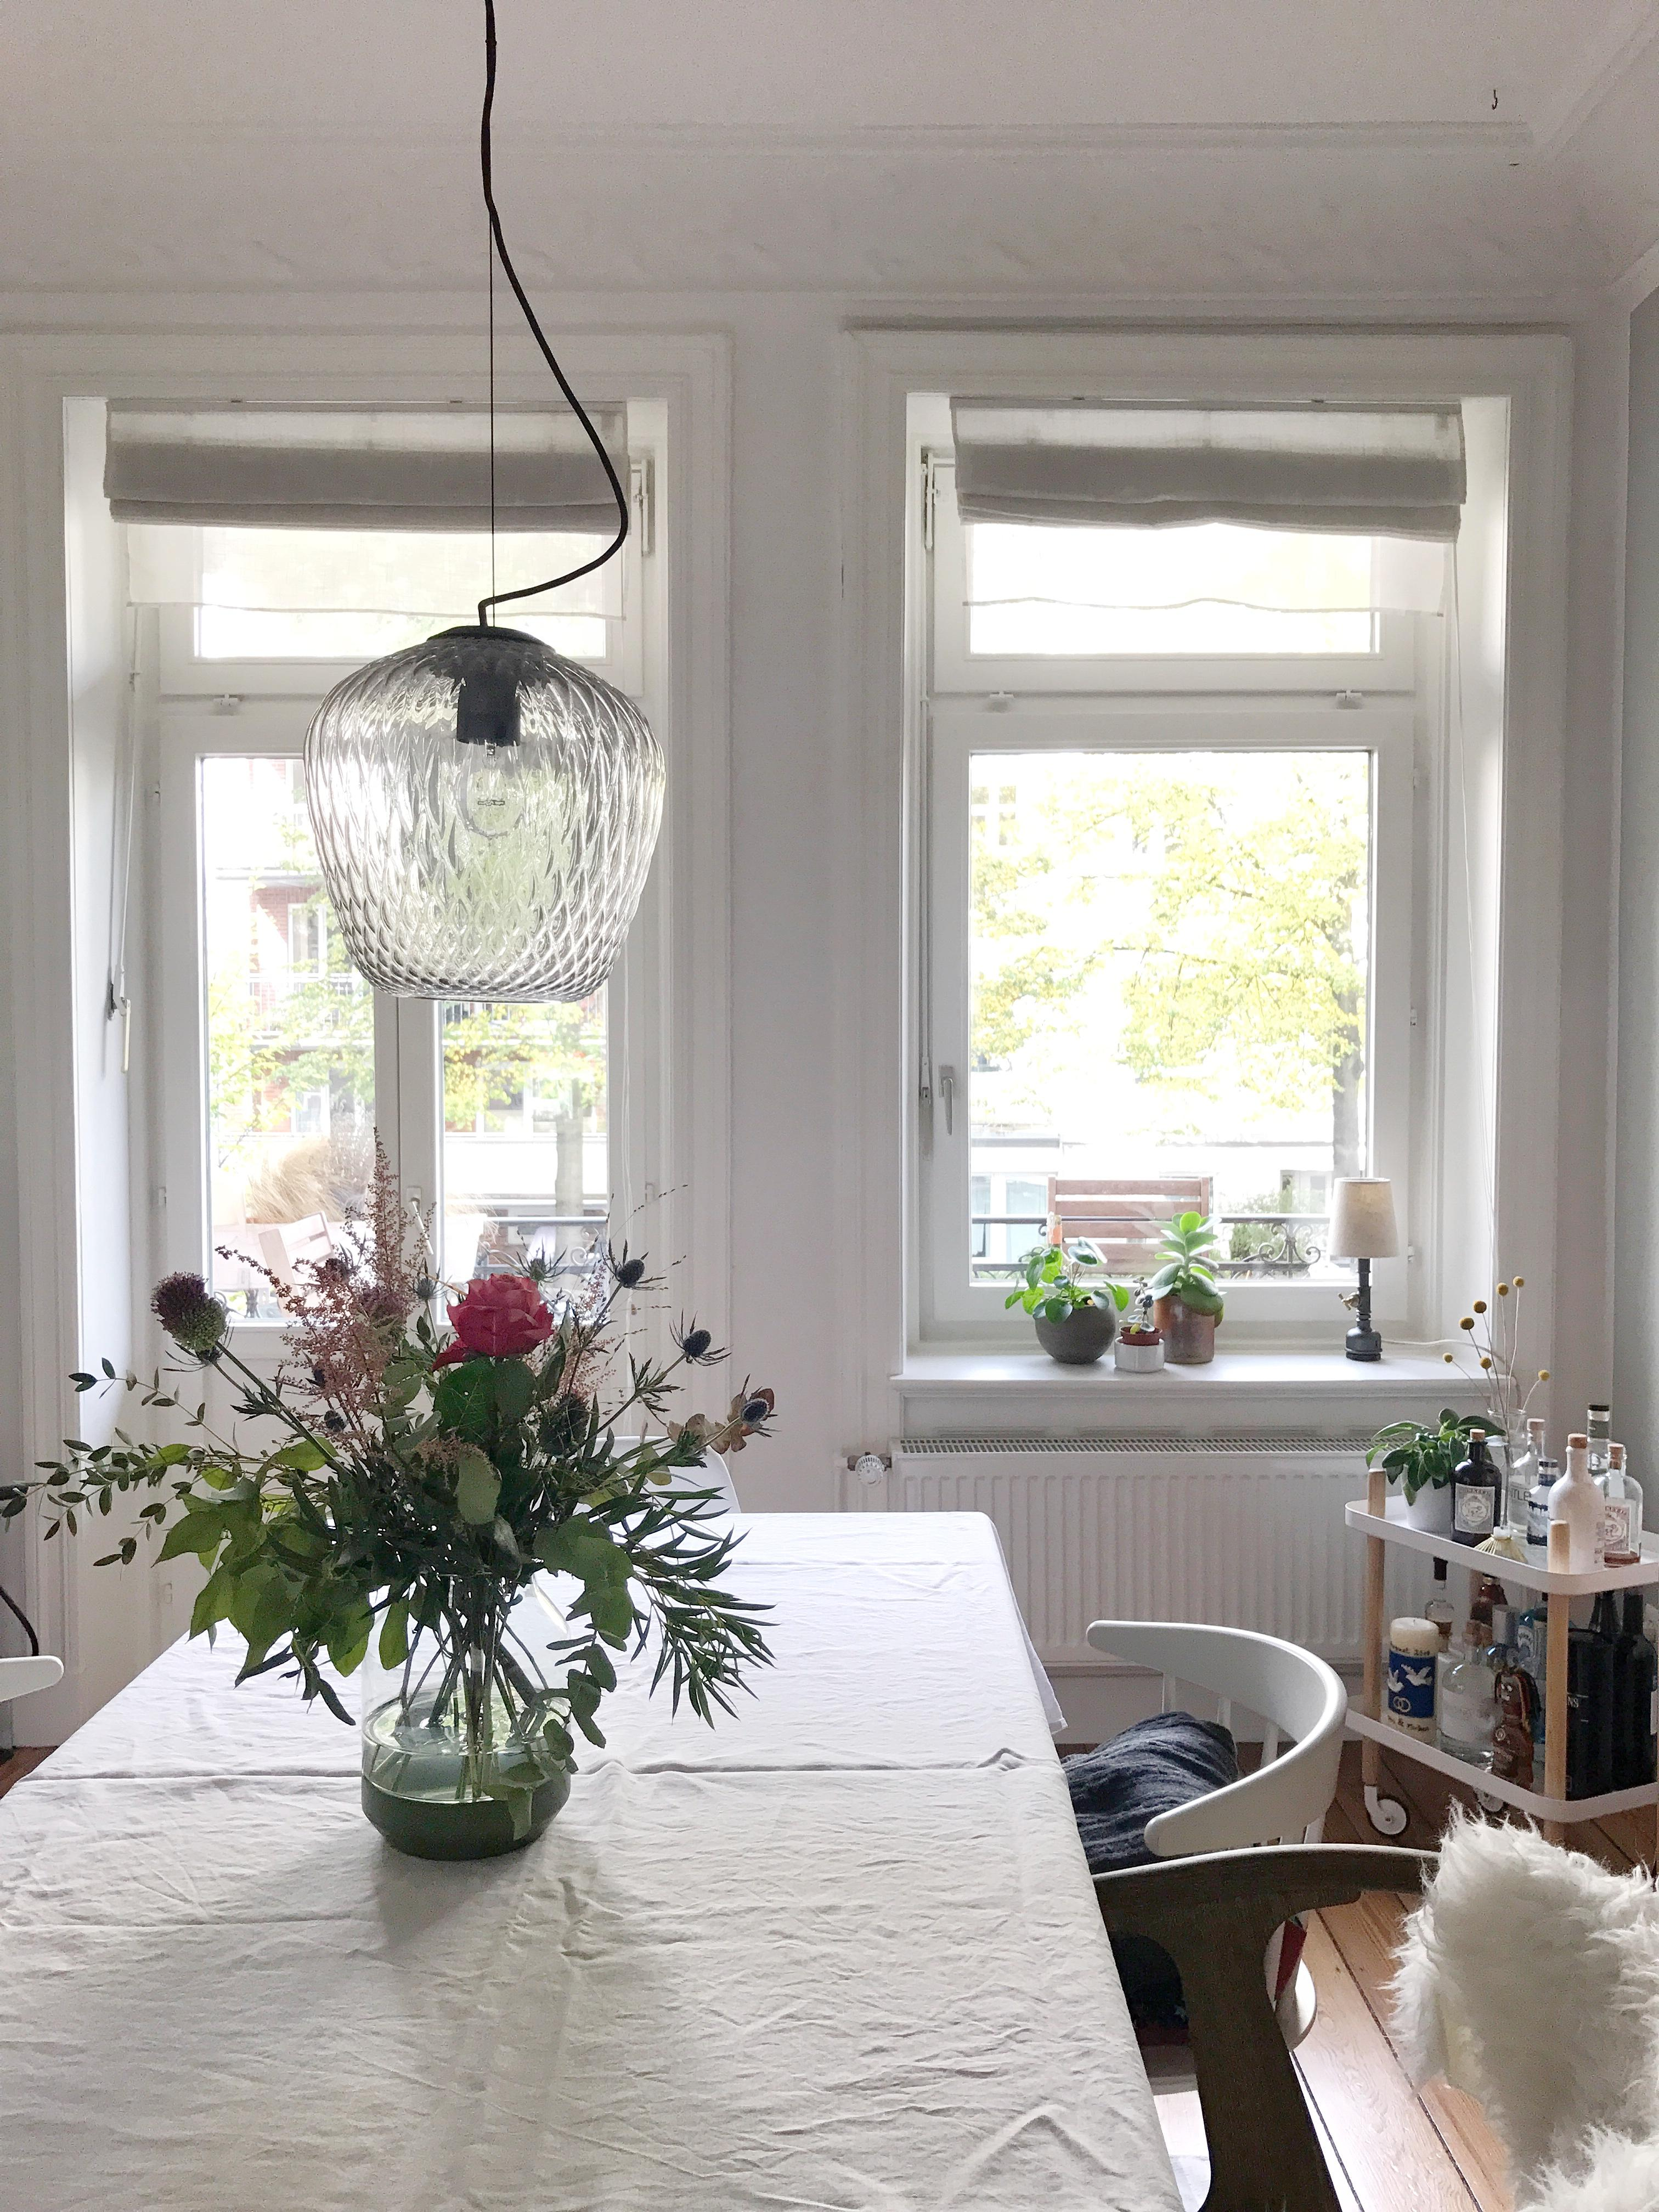 Unser #esszimmer! #skandinavisch #altbau #tischdeko #andtradition #muuto  #hay